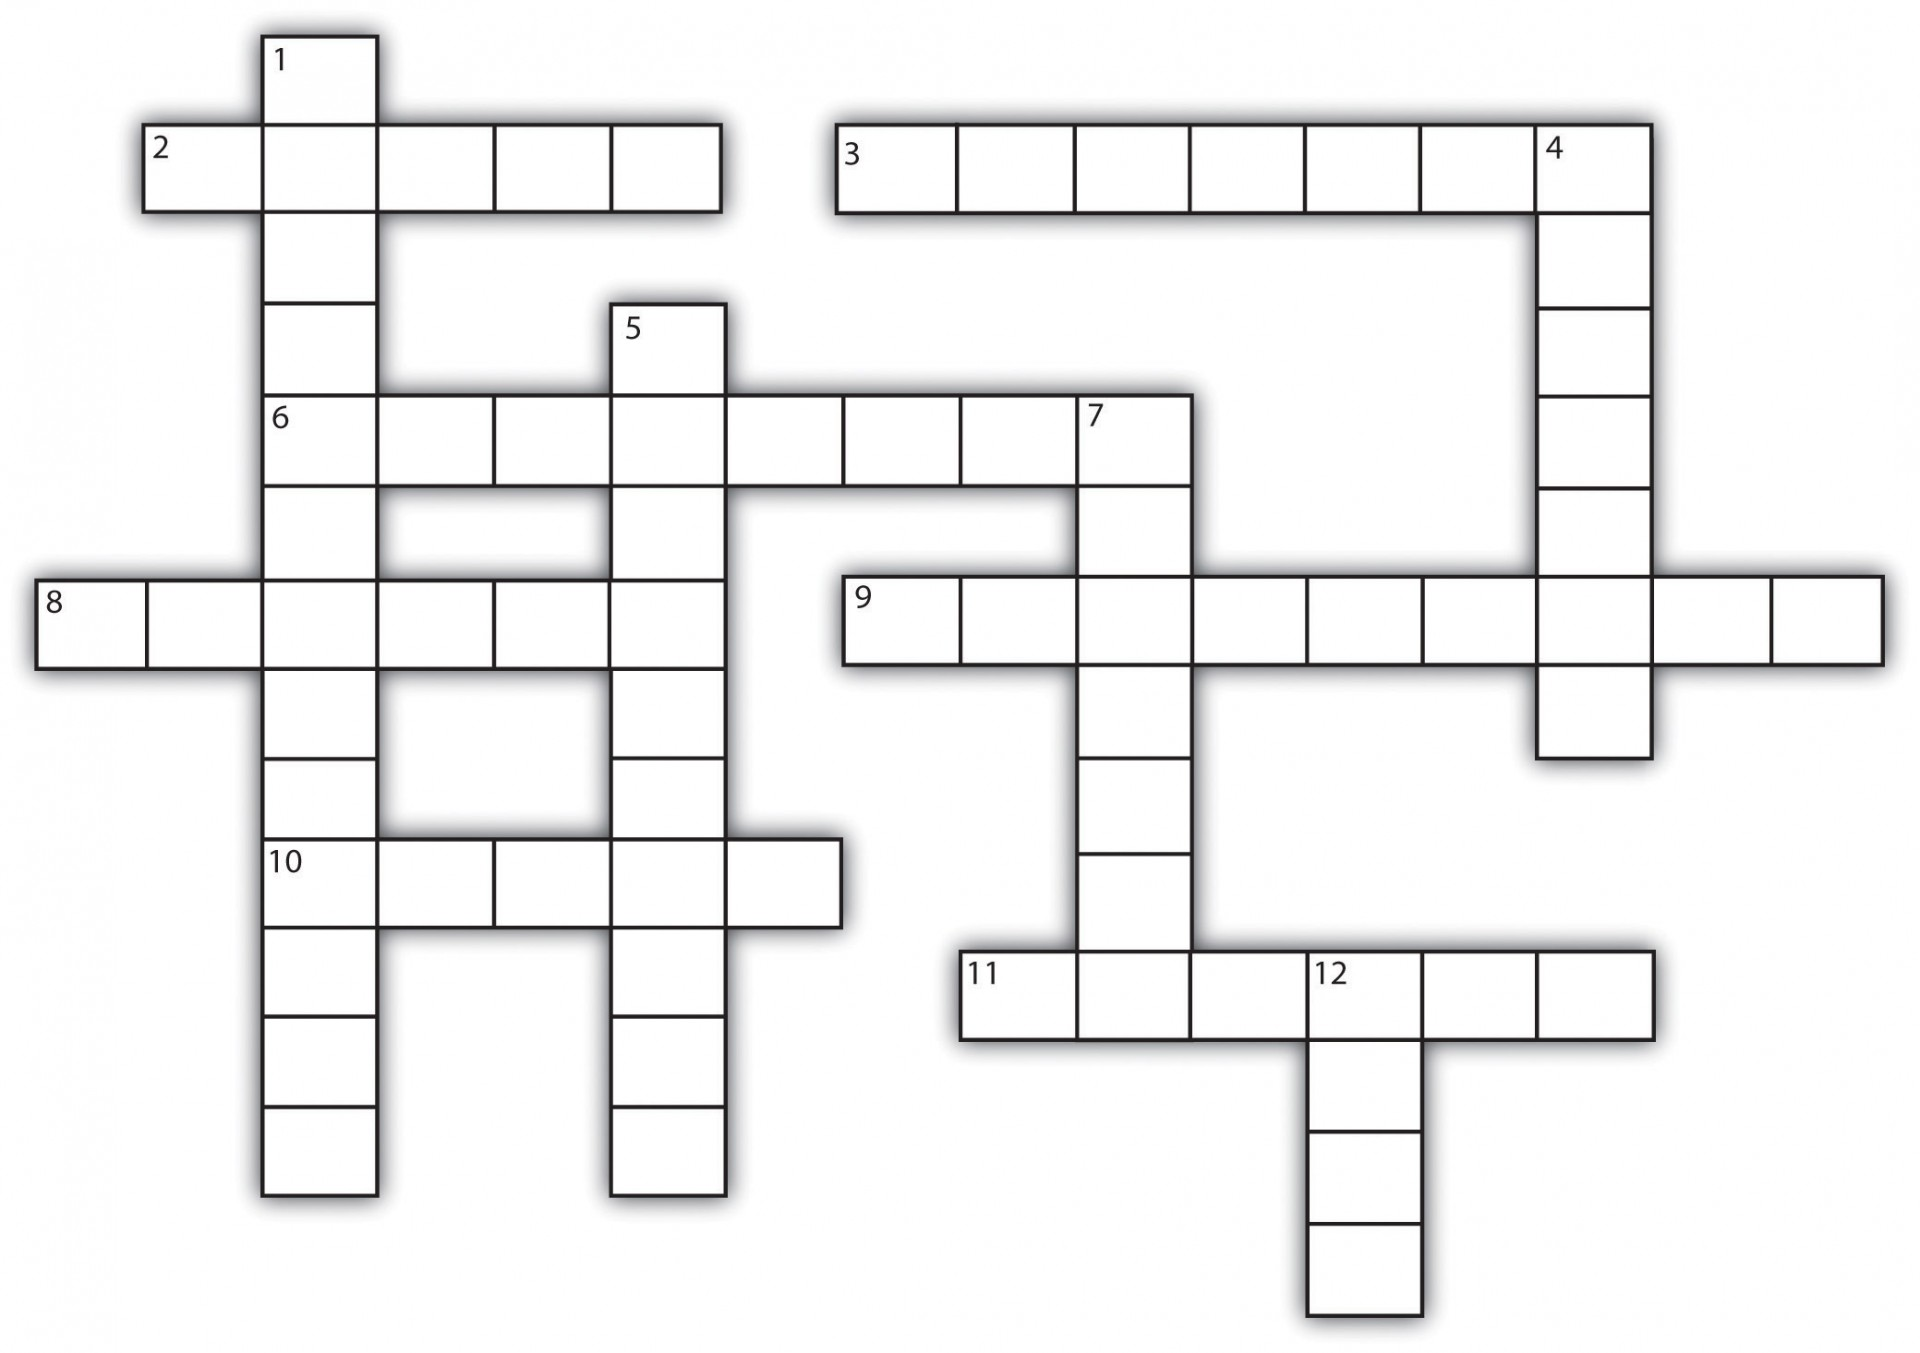 007 Essay Crossword Fascinating Byline Clue Short Puzzle Persuasive 1920